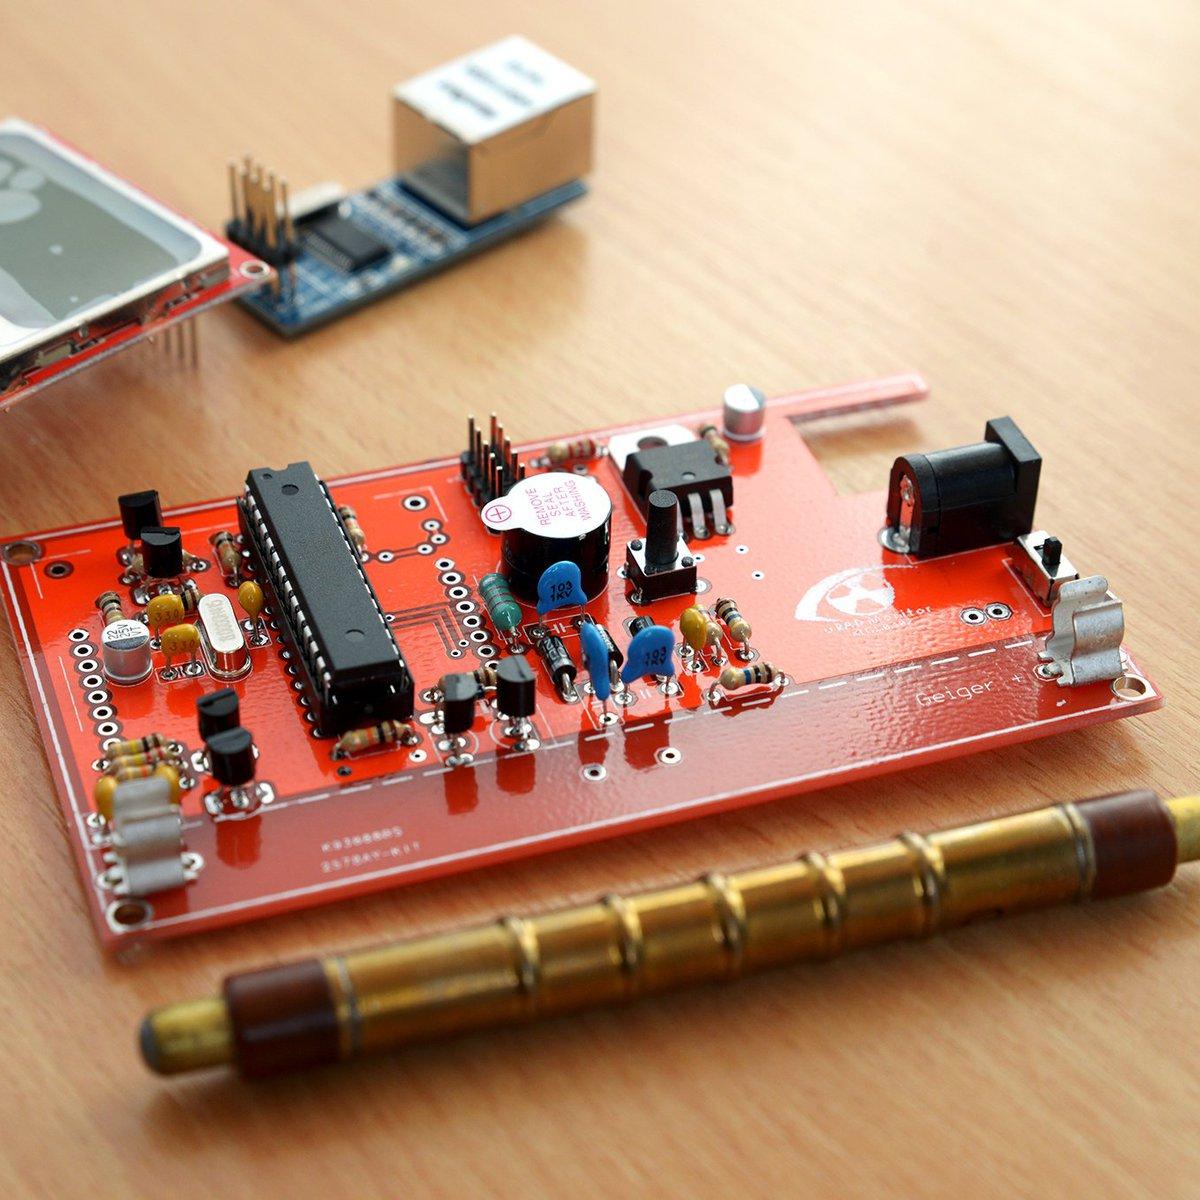 Uradmonitor Kit1 From Radhoo On Tindie Geigercountercircuit Measuringandtestcircuit Circuit Diagram